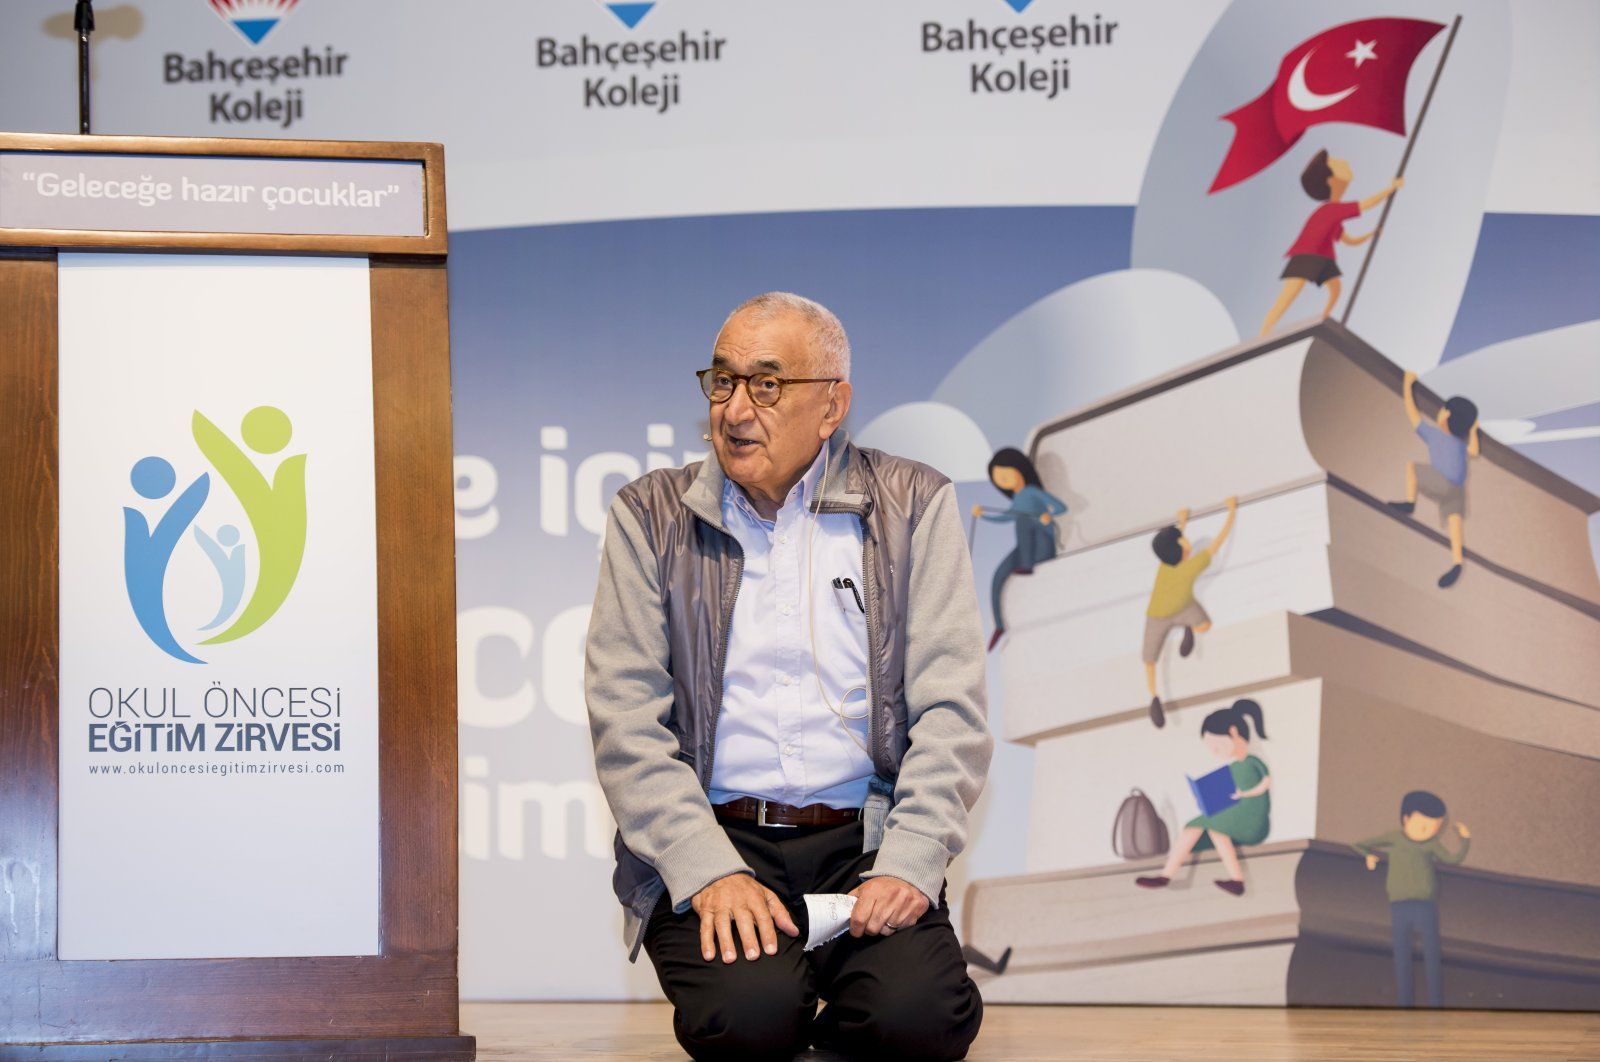 Doğan Cüceloğlu speaks at a conference in Istanbul, Turkey, May 6, 2017. (PHOTO BY YAĞMUR DİNÇ)